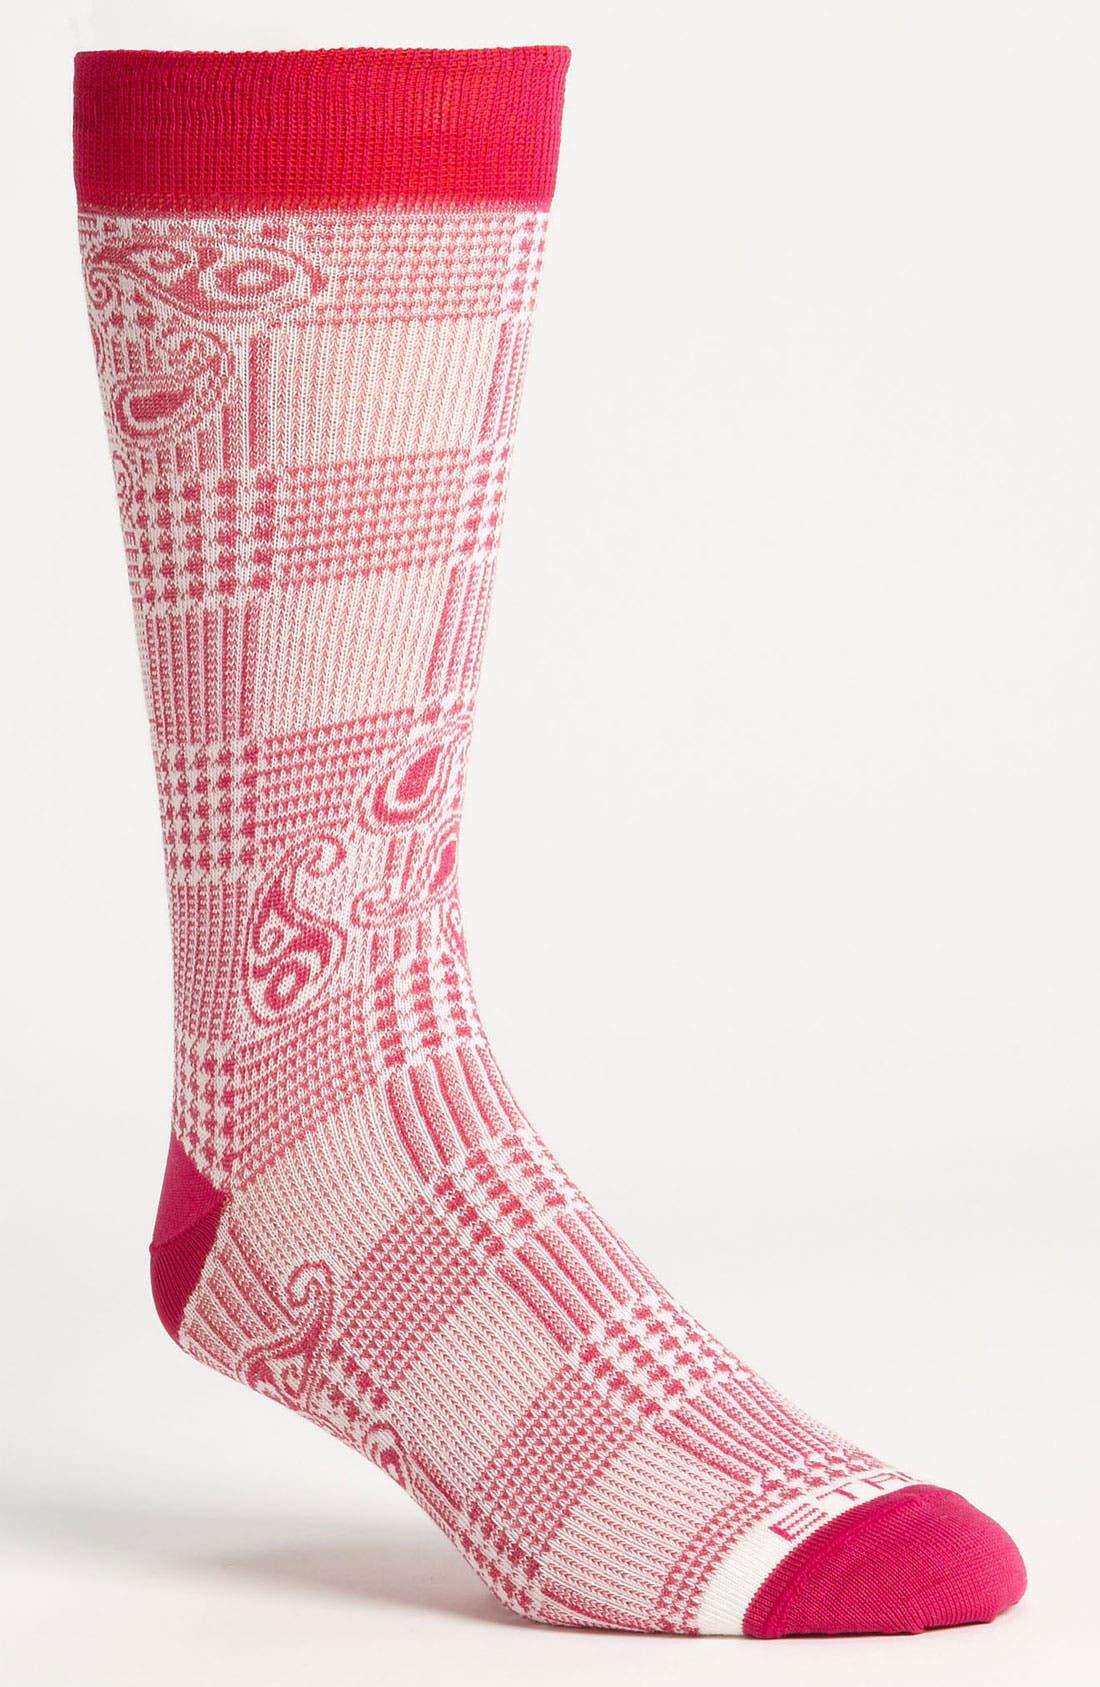 Alternate Image 1 Selected - Etro Herringbone Paisley Socks